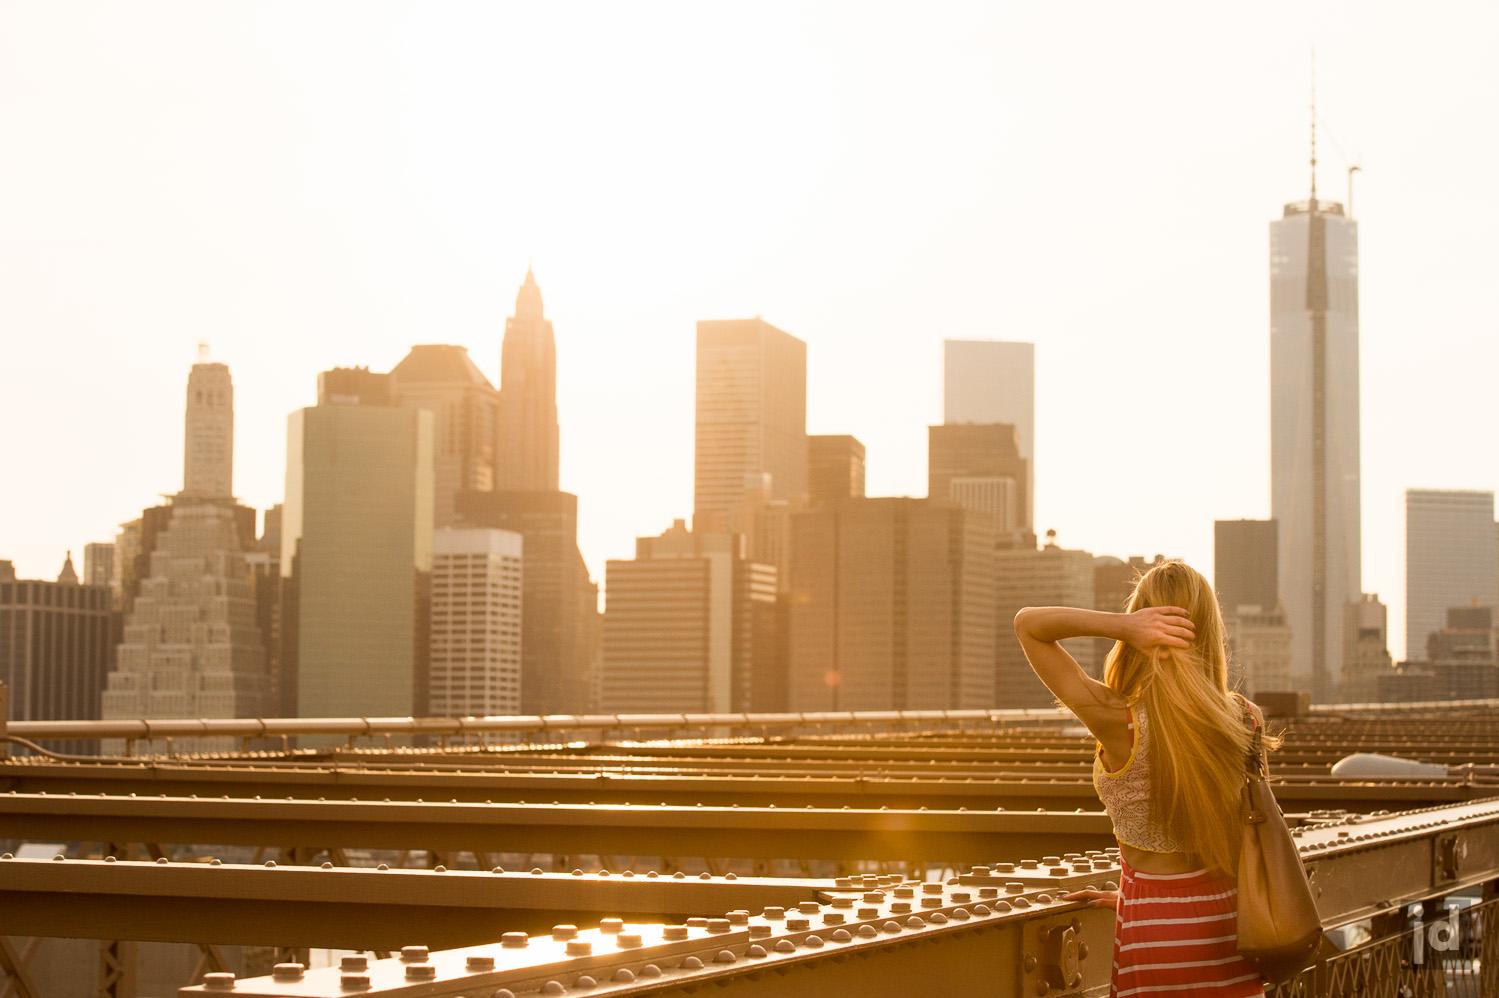 NewYork_USA_Photography_Jason_Davis_Images_057.jpg